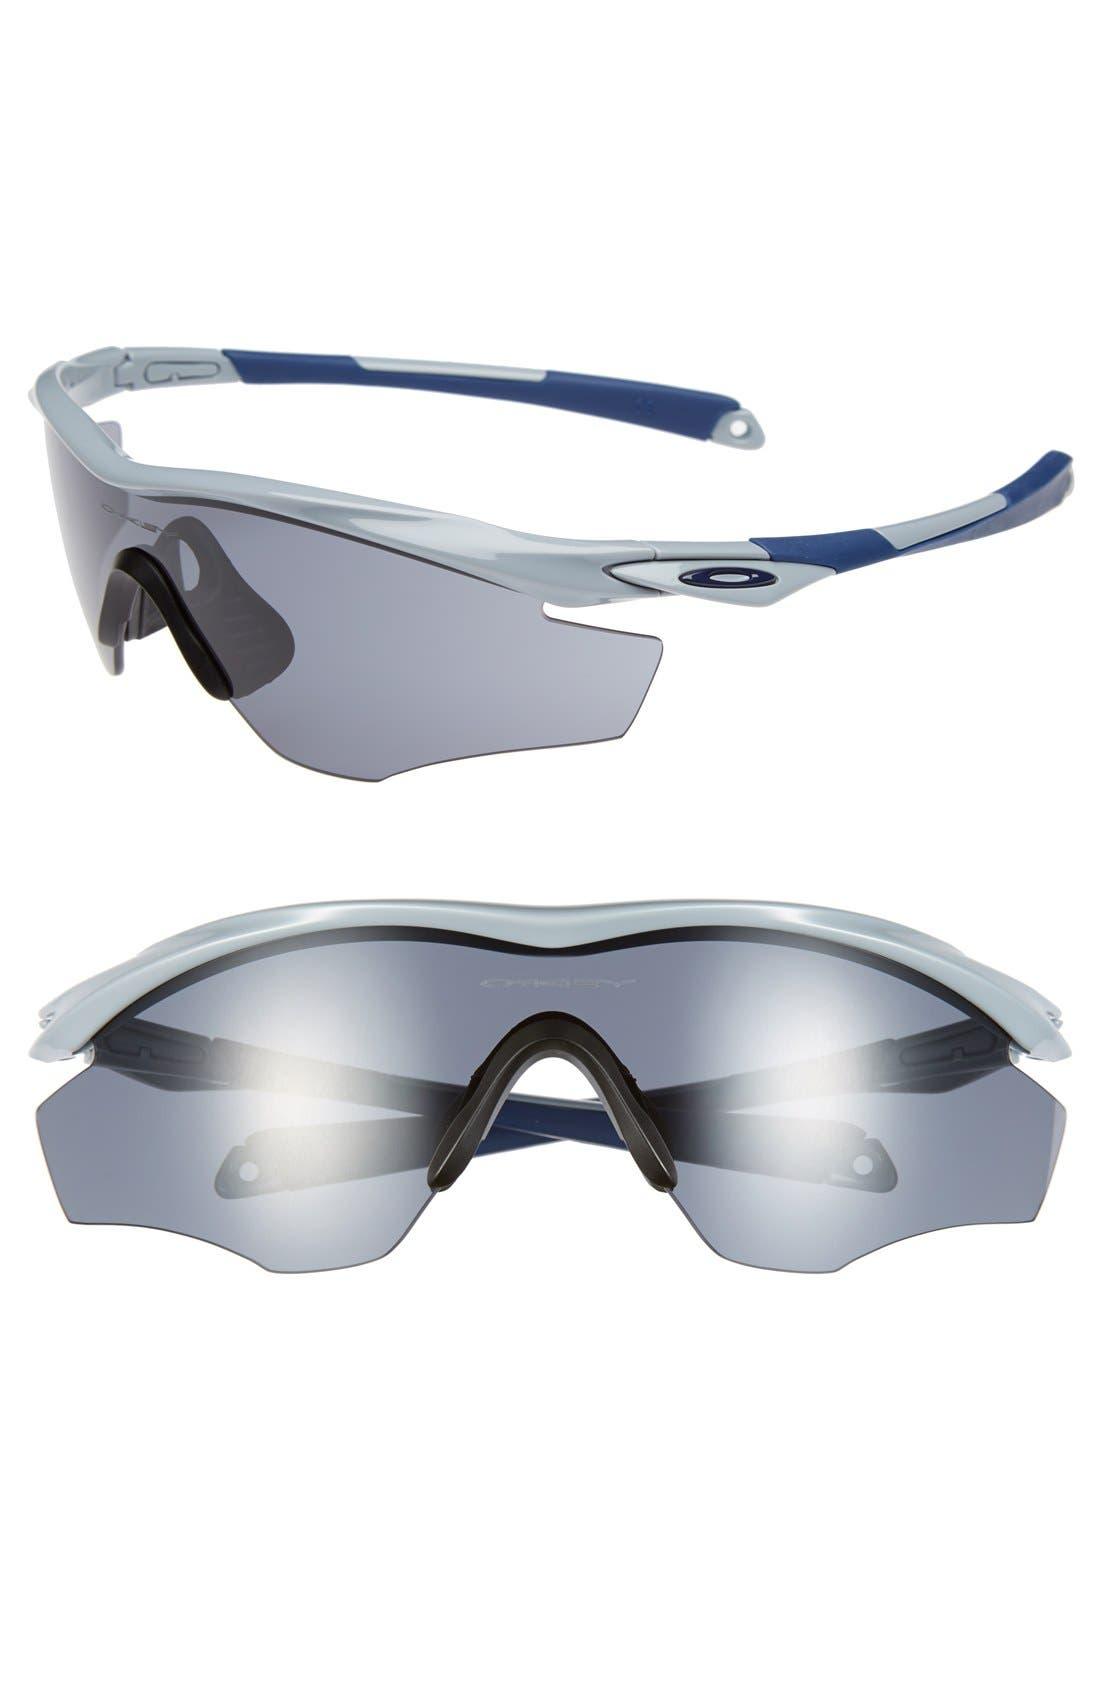 Main Image - Oakley 'M2 Frame' 175mm Shield Sunglasses